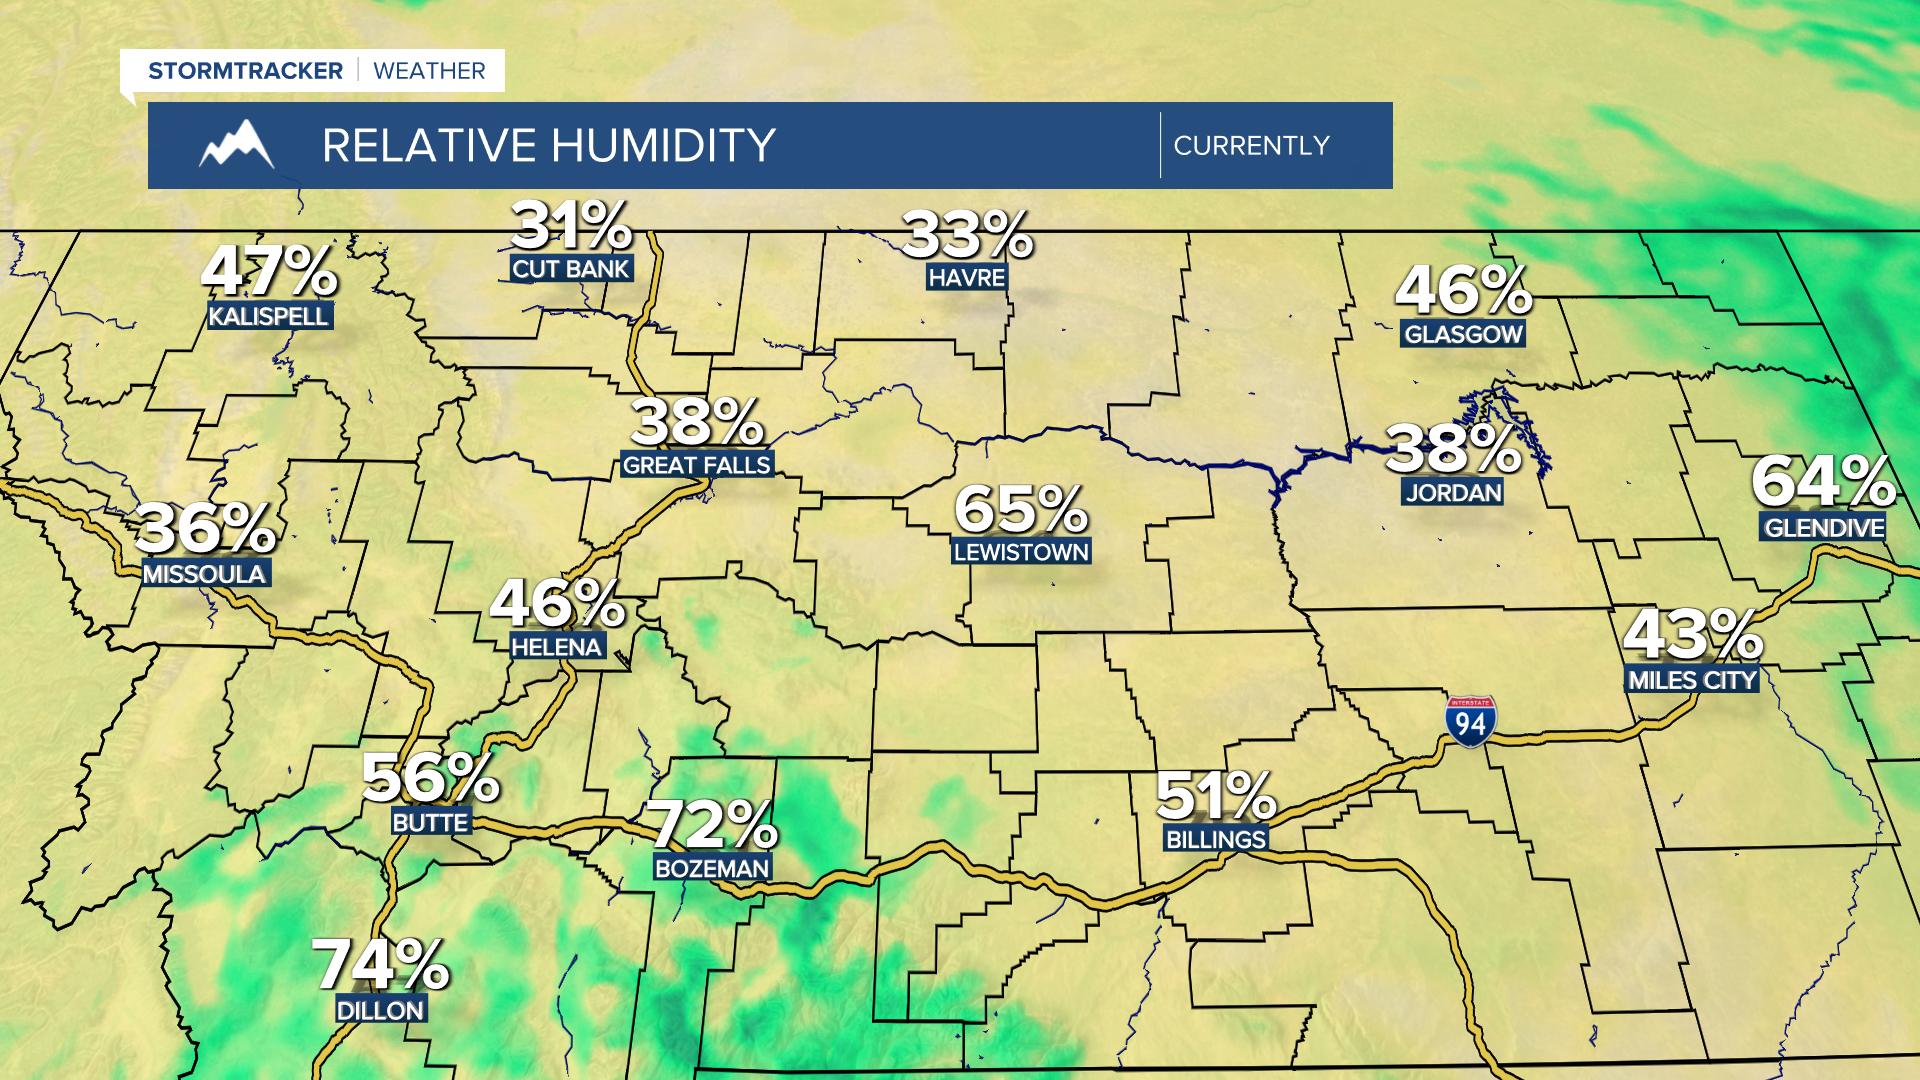 MT Current Relative Humidity